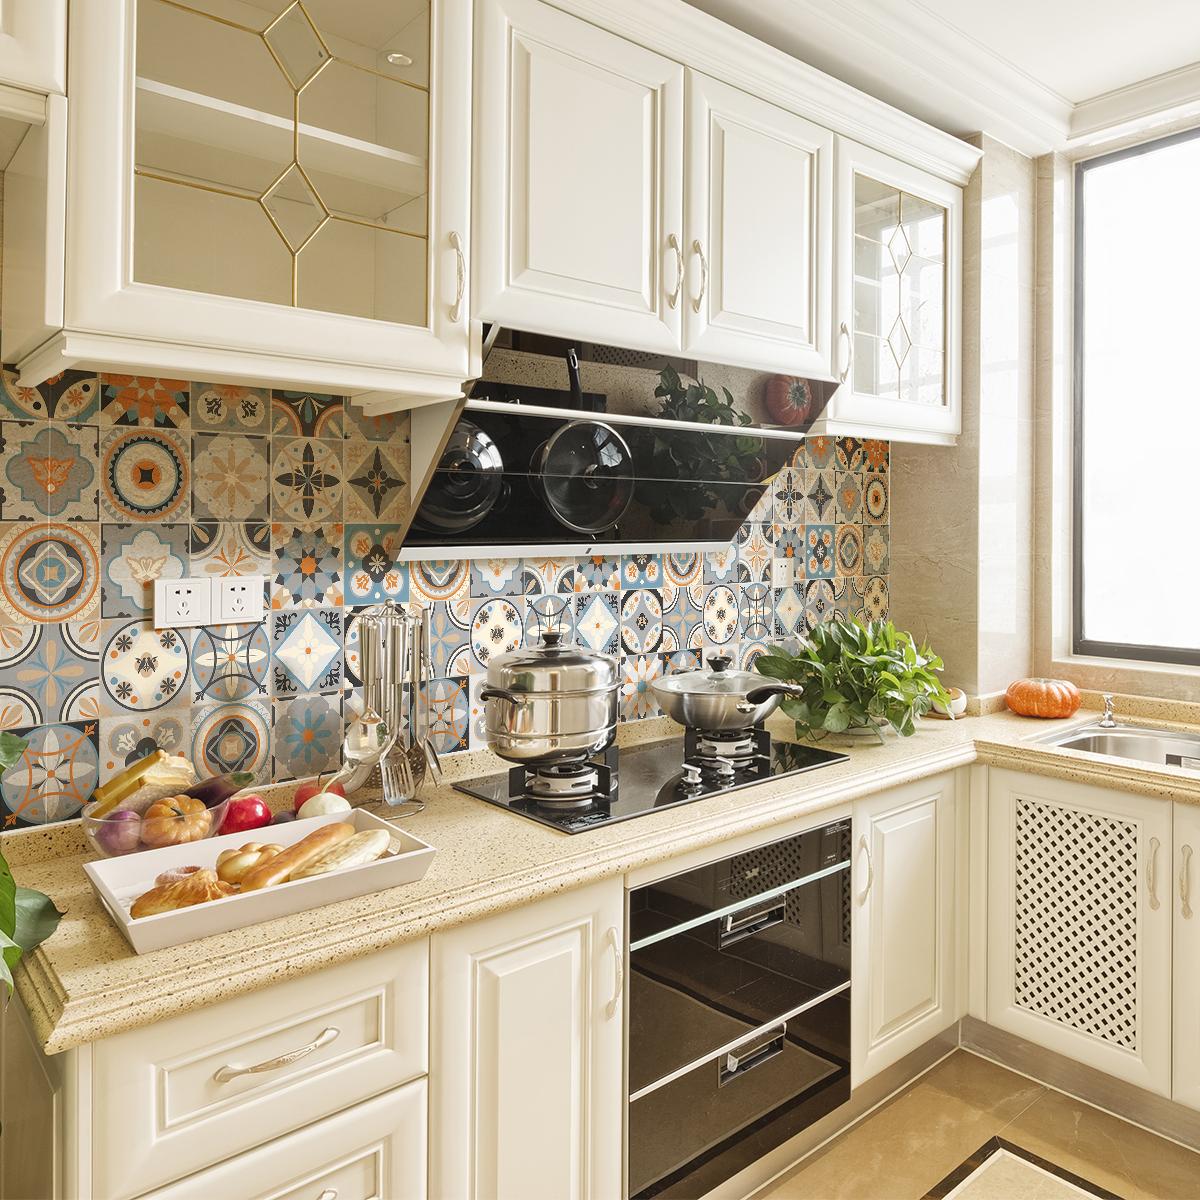 24 stickers carrelages azulejos grazelano cuisine - Stickers cuisine carrelage ...